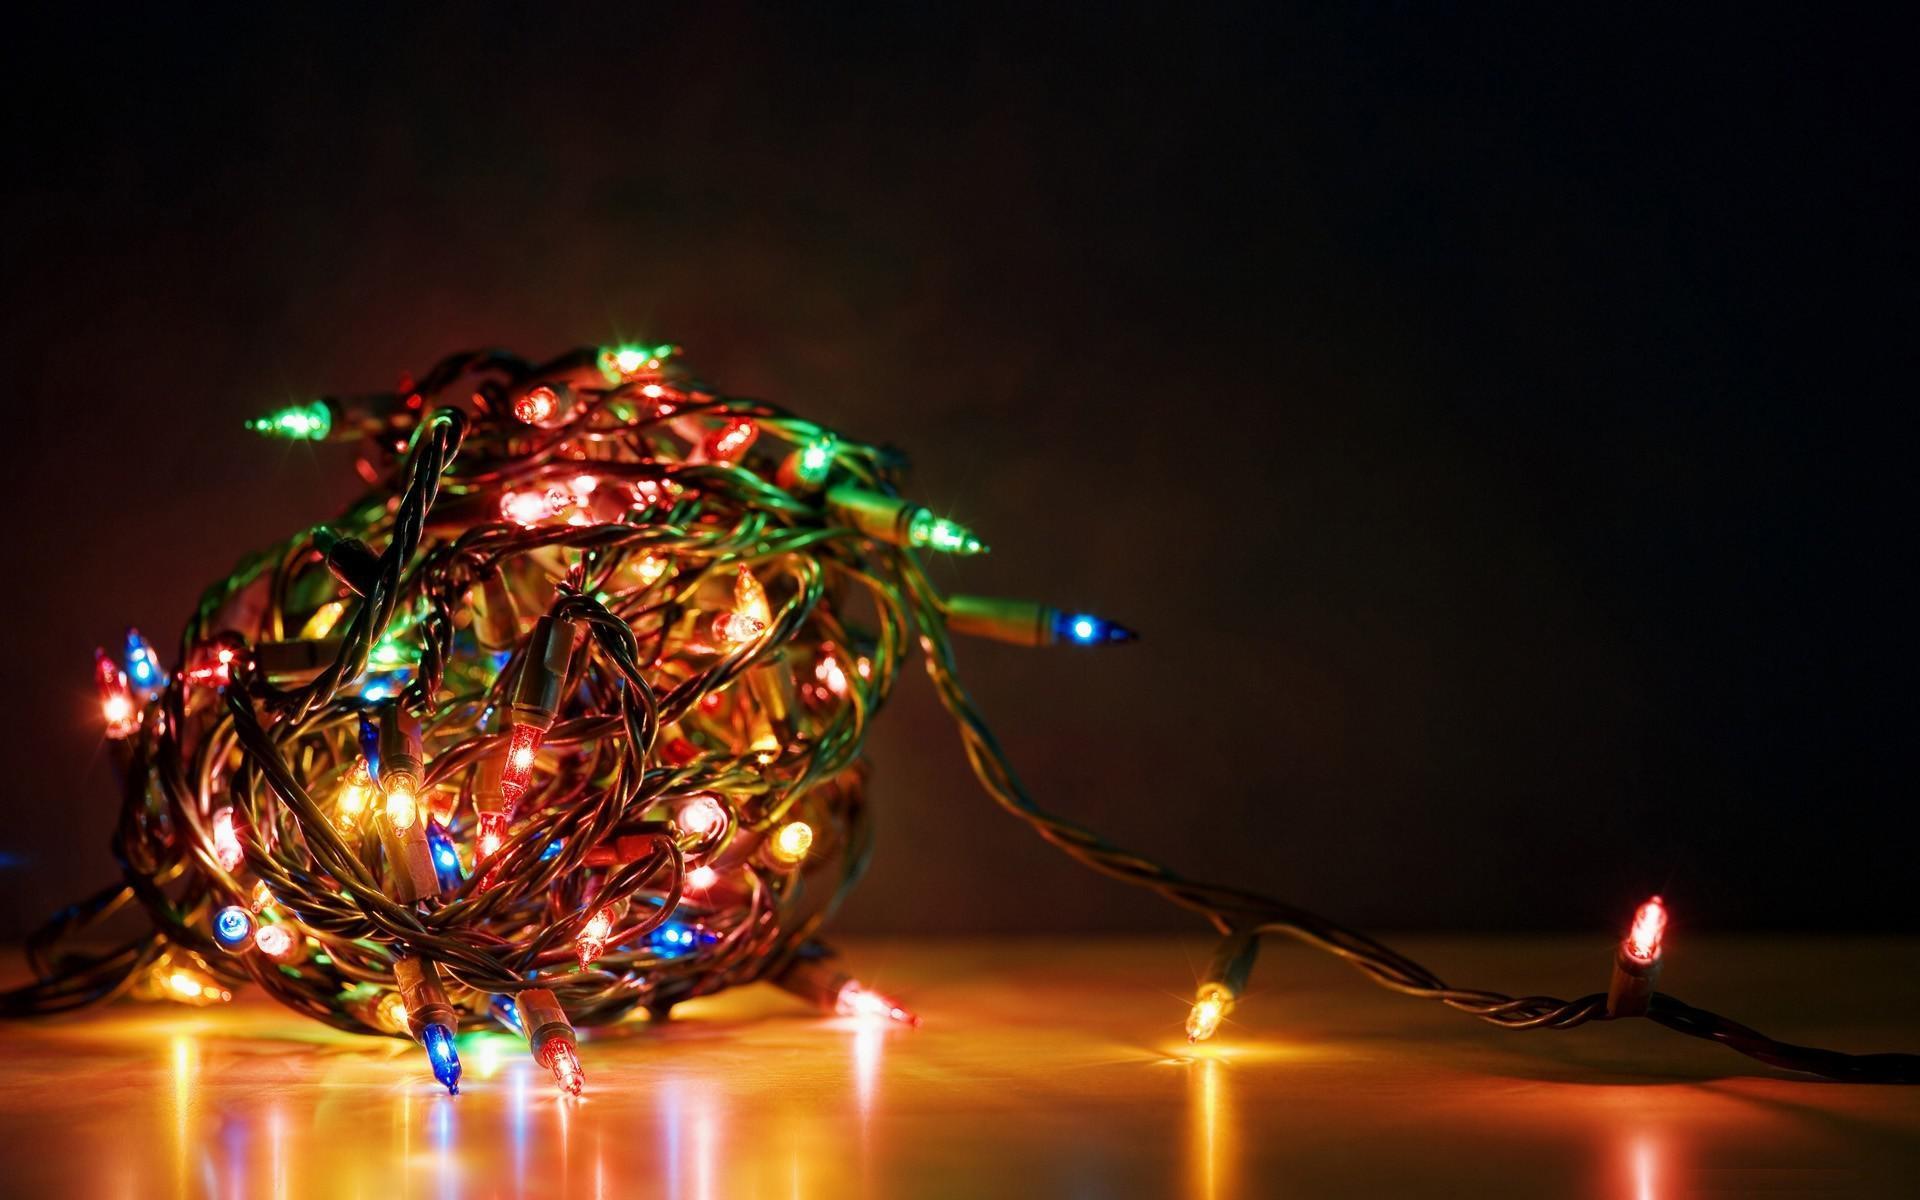 Christmas Lights Wallpapers - THIS Wallpaper